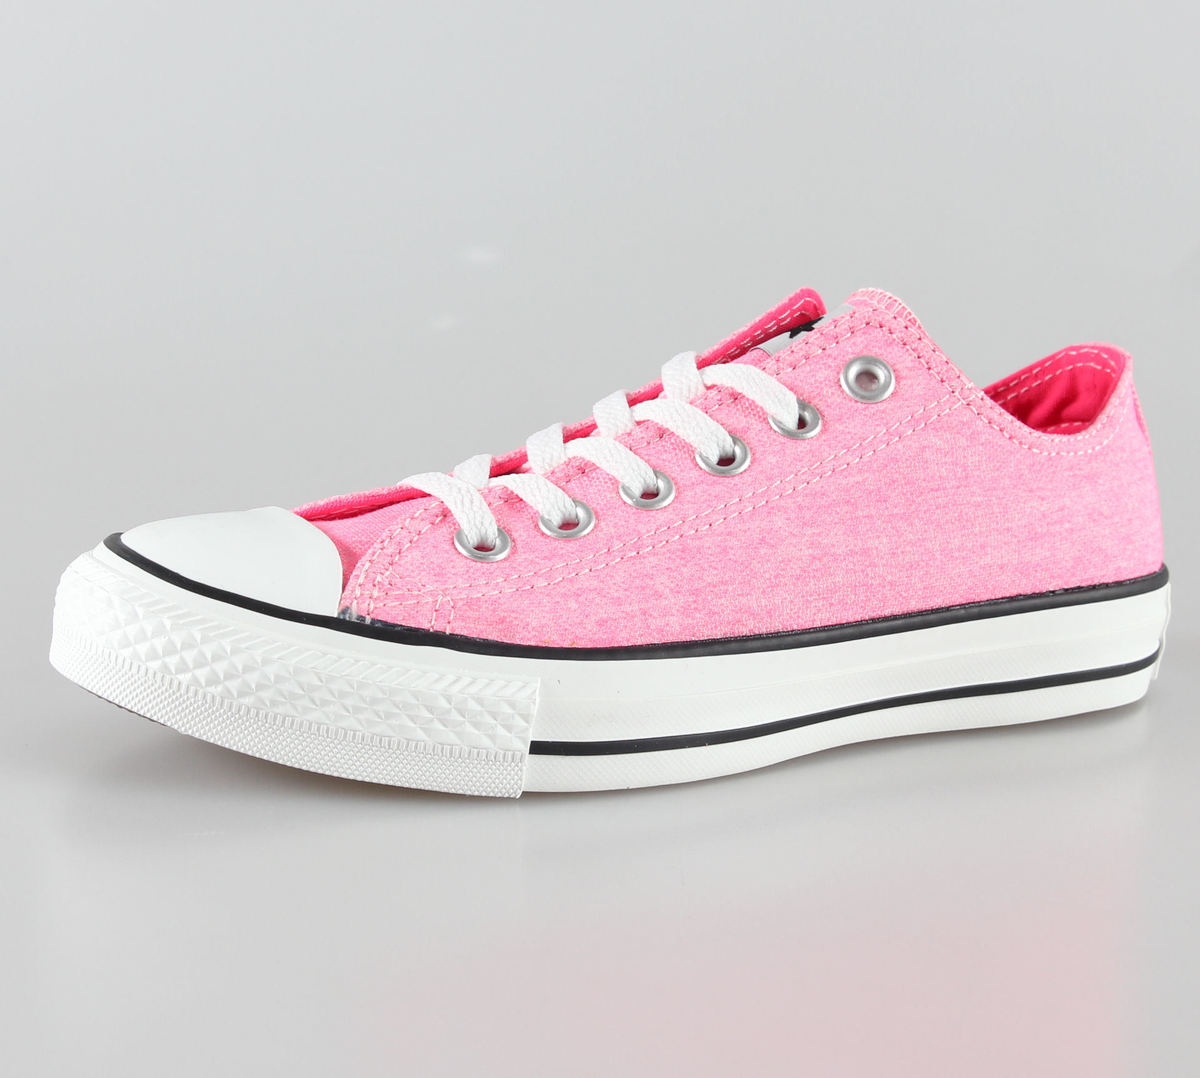 boty dámské CONVERSE - Chuck Taylor All Star OX - NEON - Neon/Pink - C136584